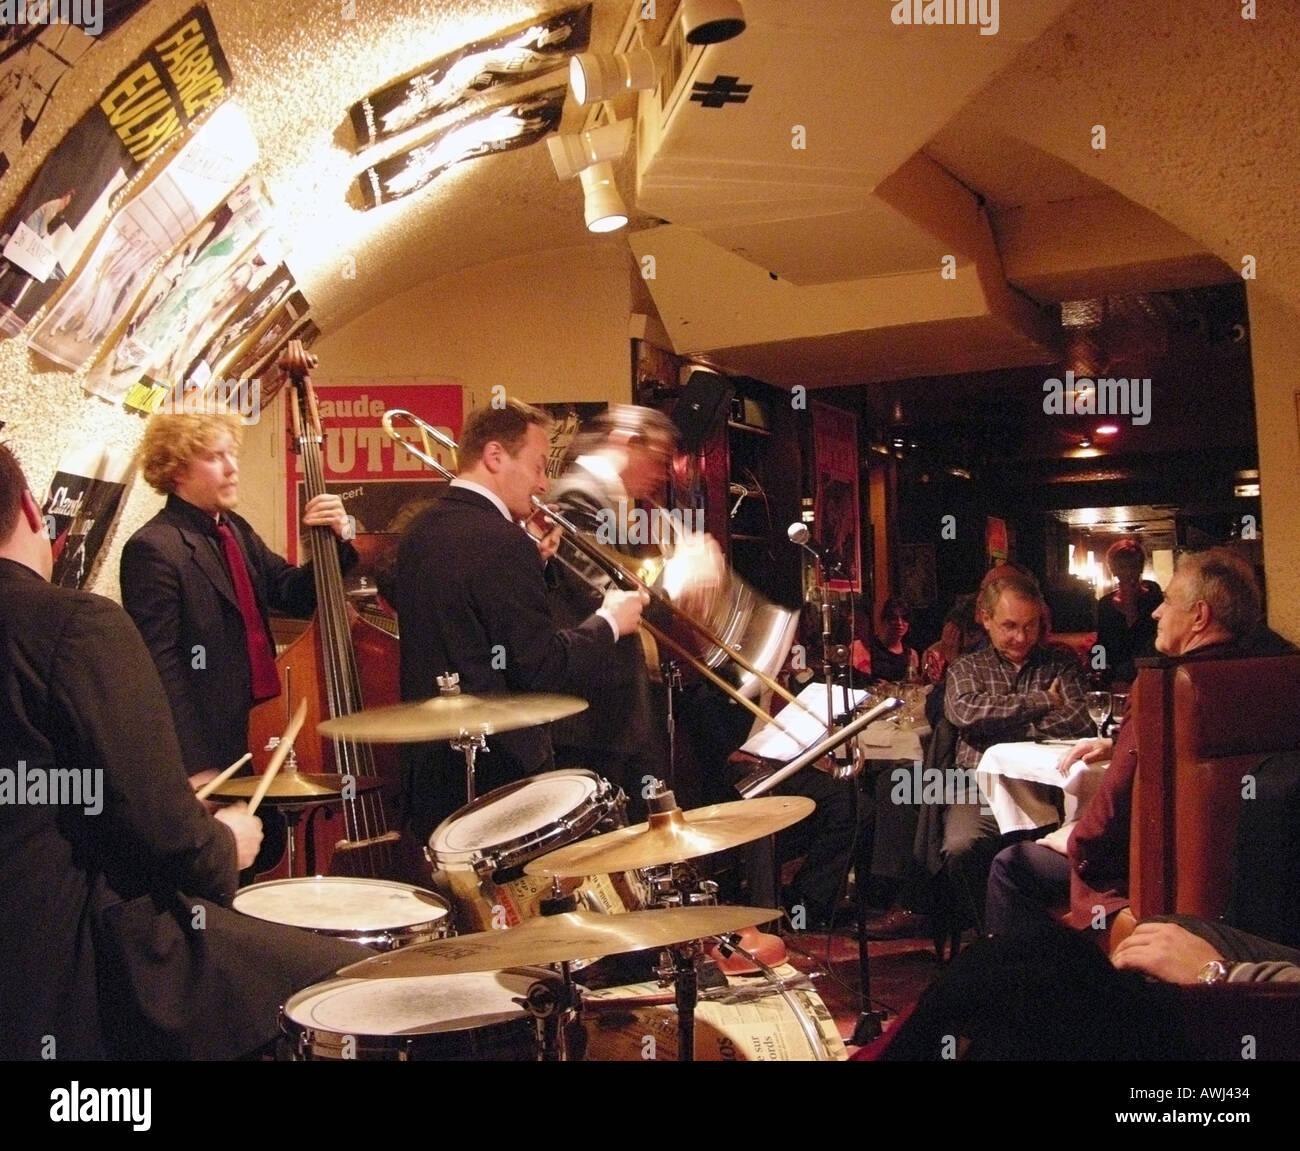 Jazz musicians playing in le Petit Journal jazz club Paris - Stock Image